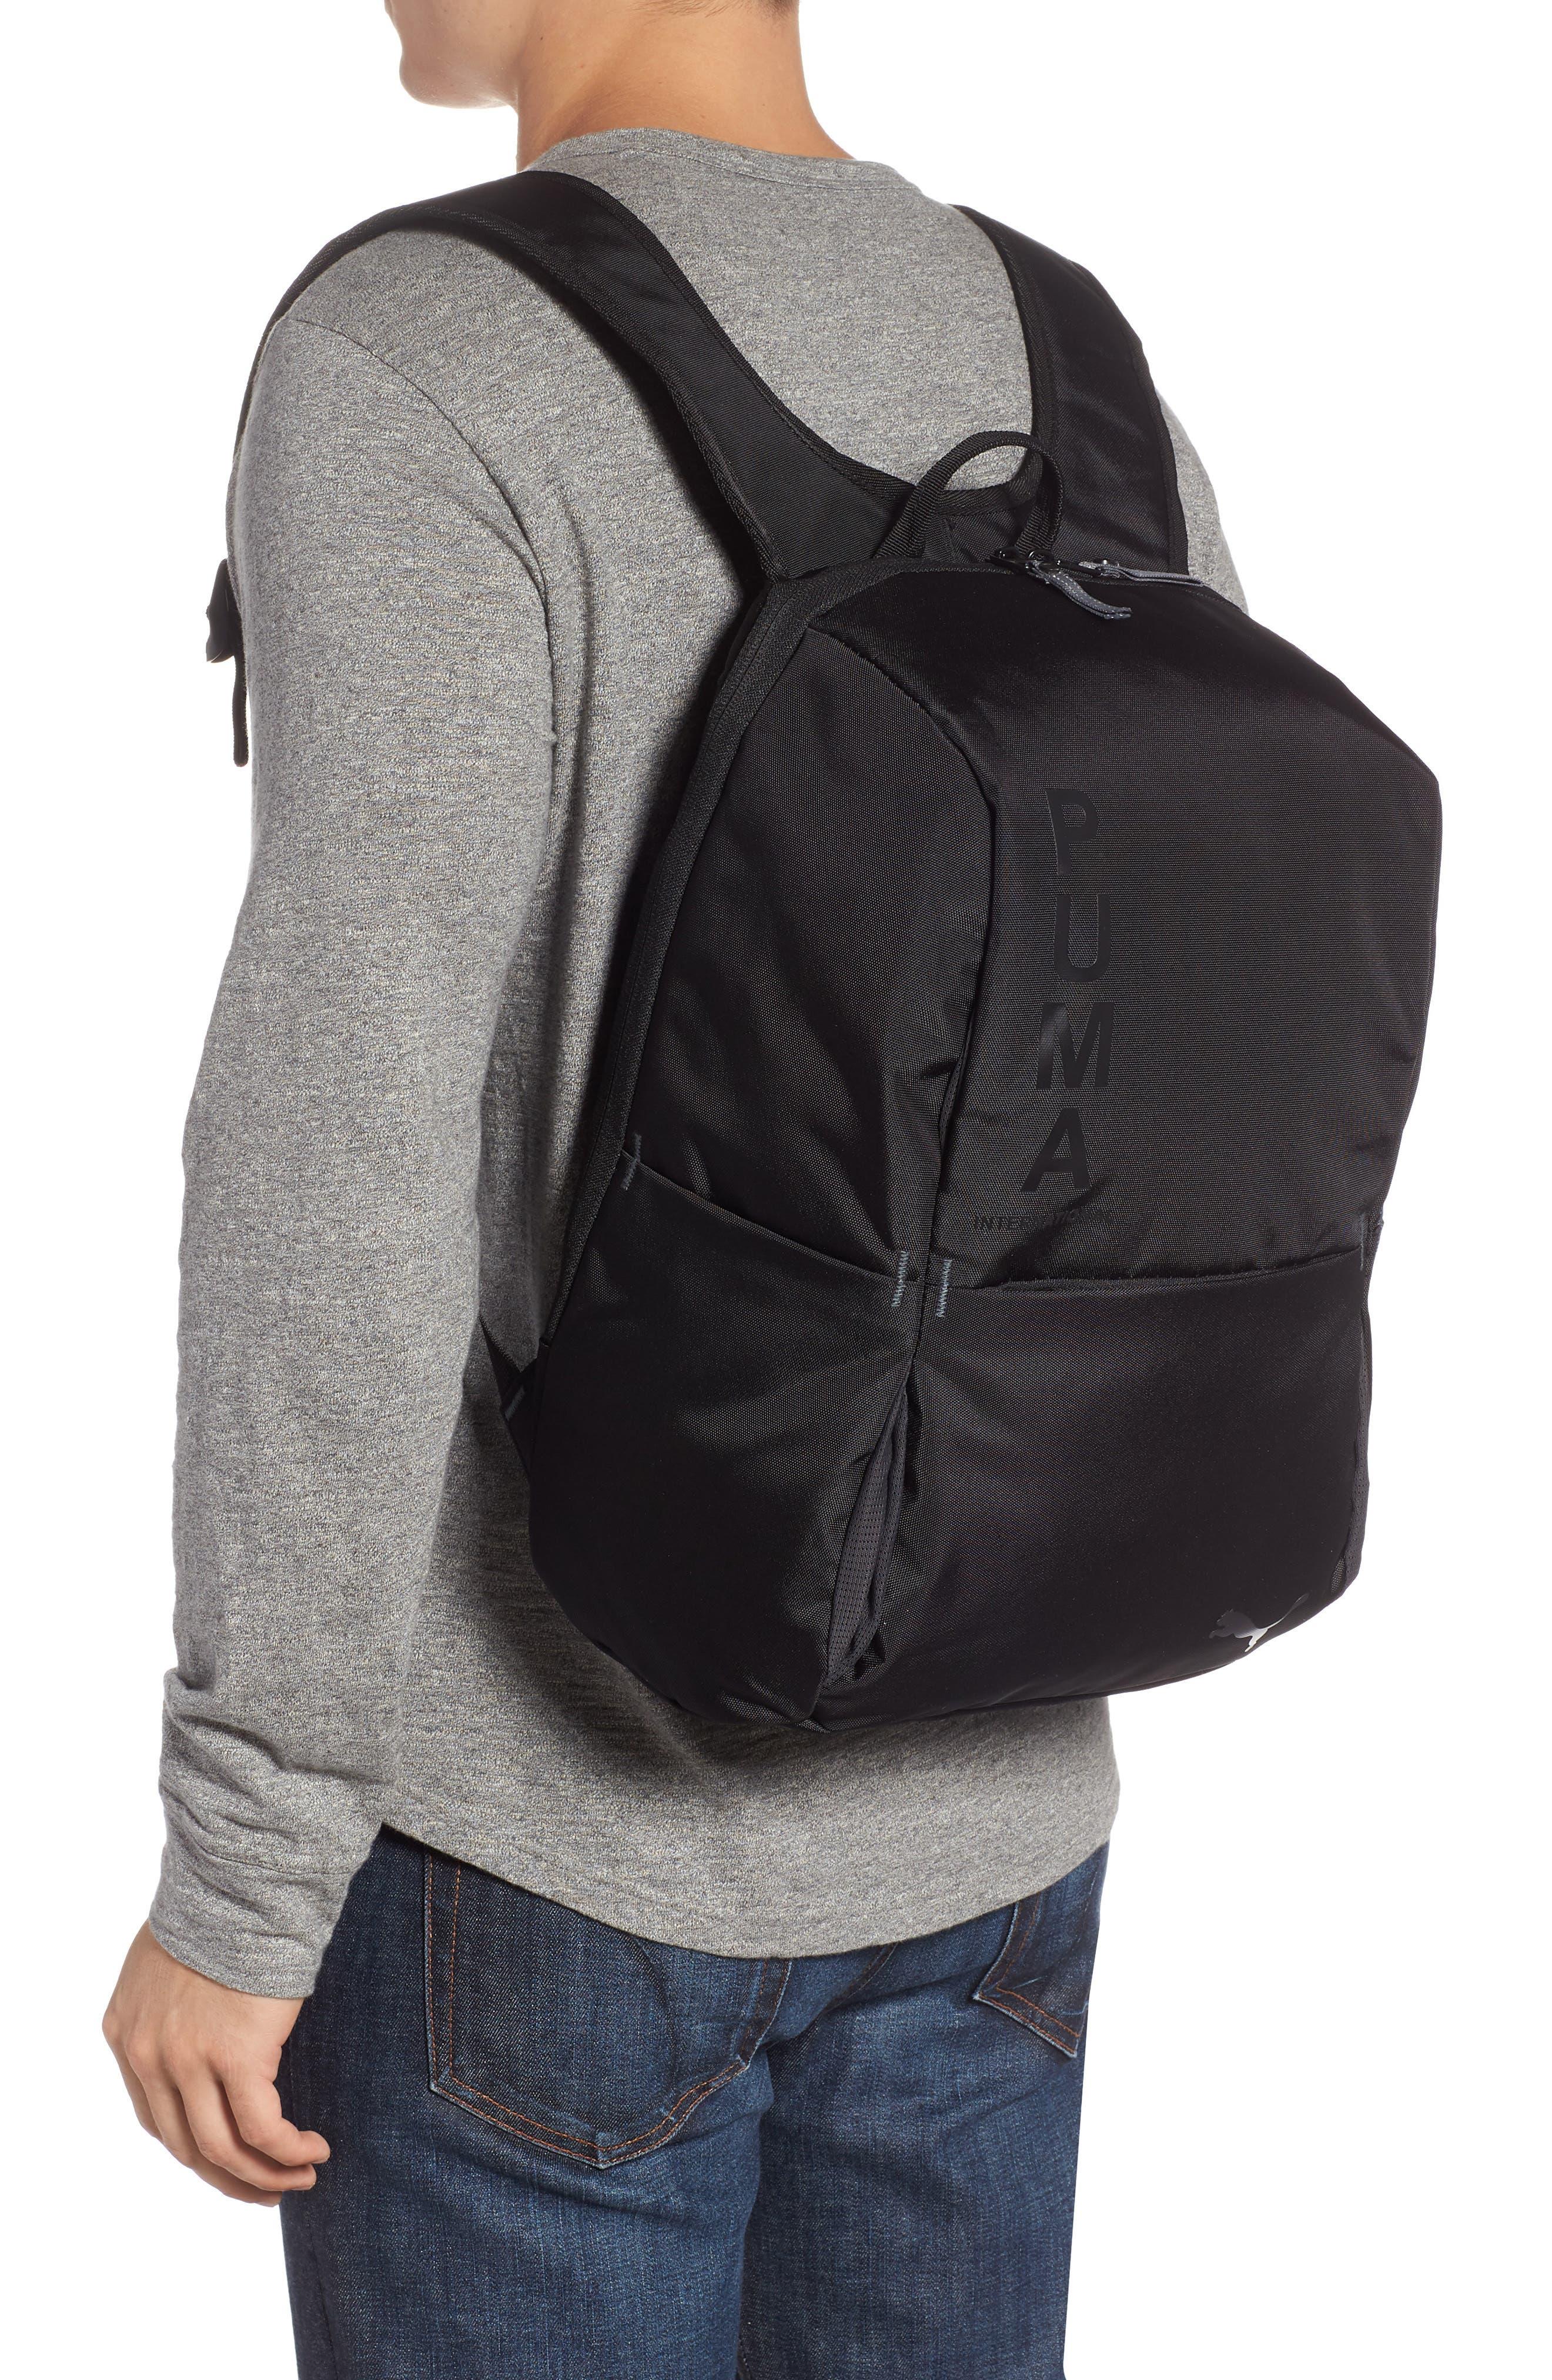 Ace Backpack,                             Alternate thumbnail 2, color,                             BLACK